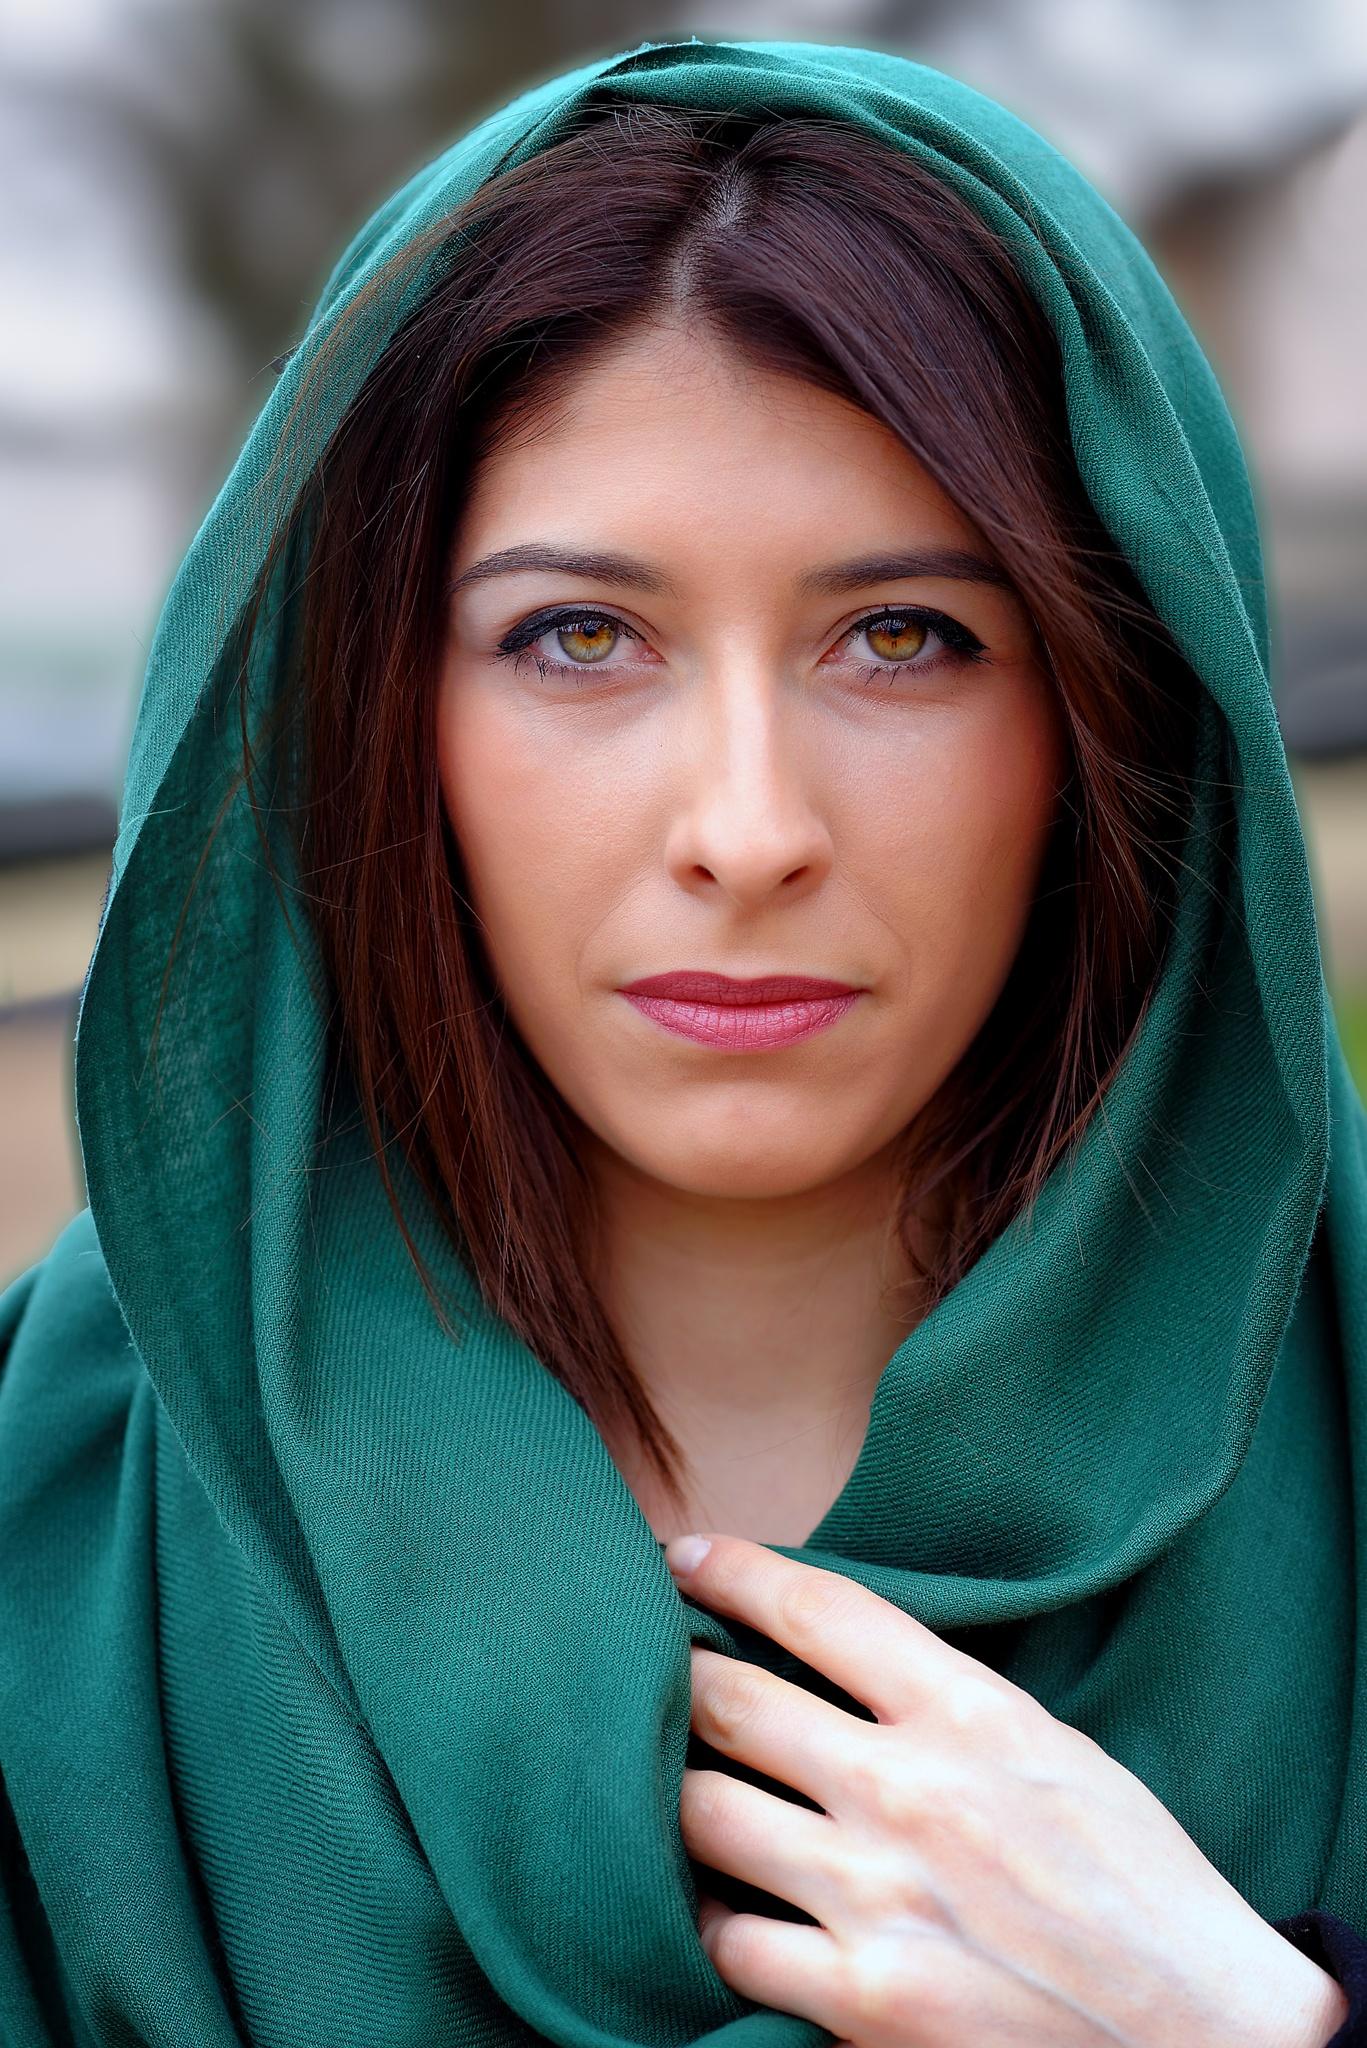 Beauty in Green by samirzahirovic14